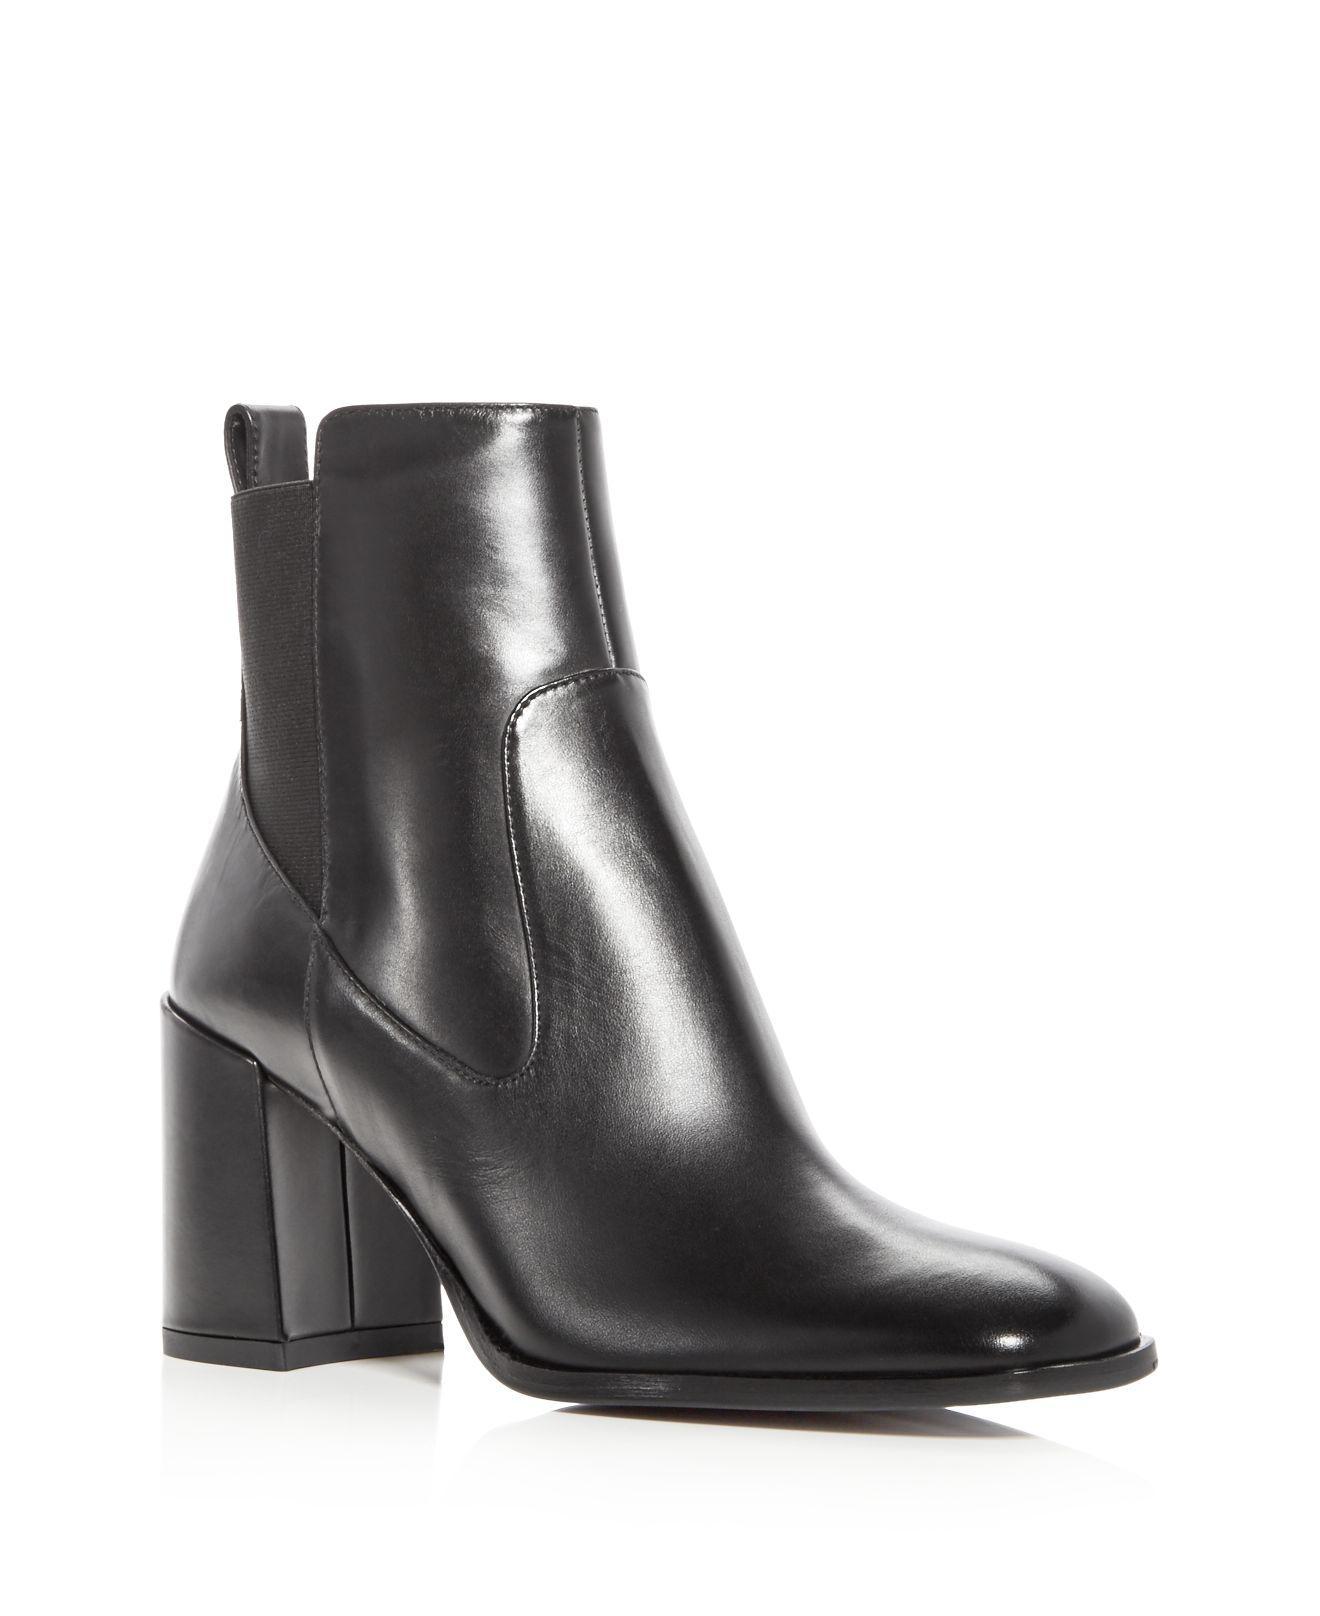 Via Spiga Woman's Delaney Leather High-Heel Booties FbuWGIgX